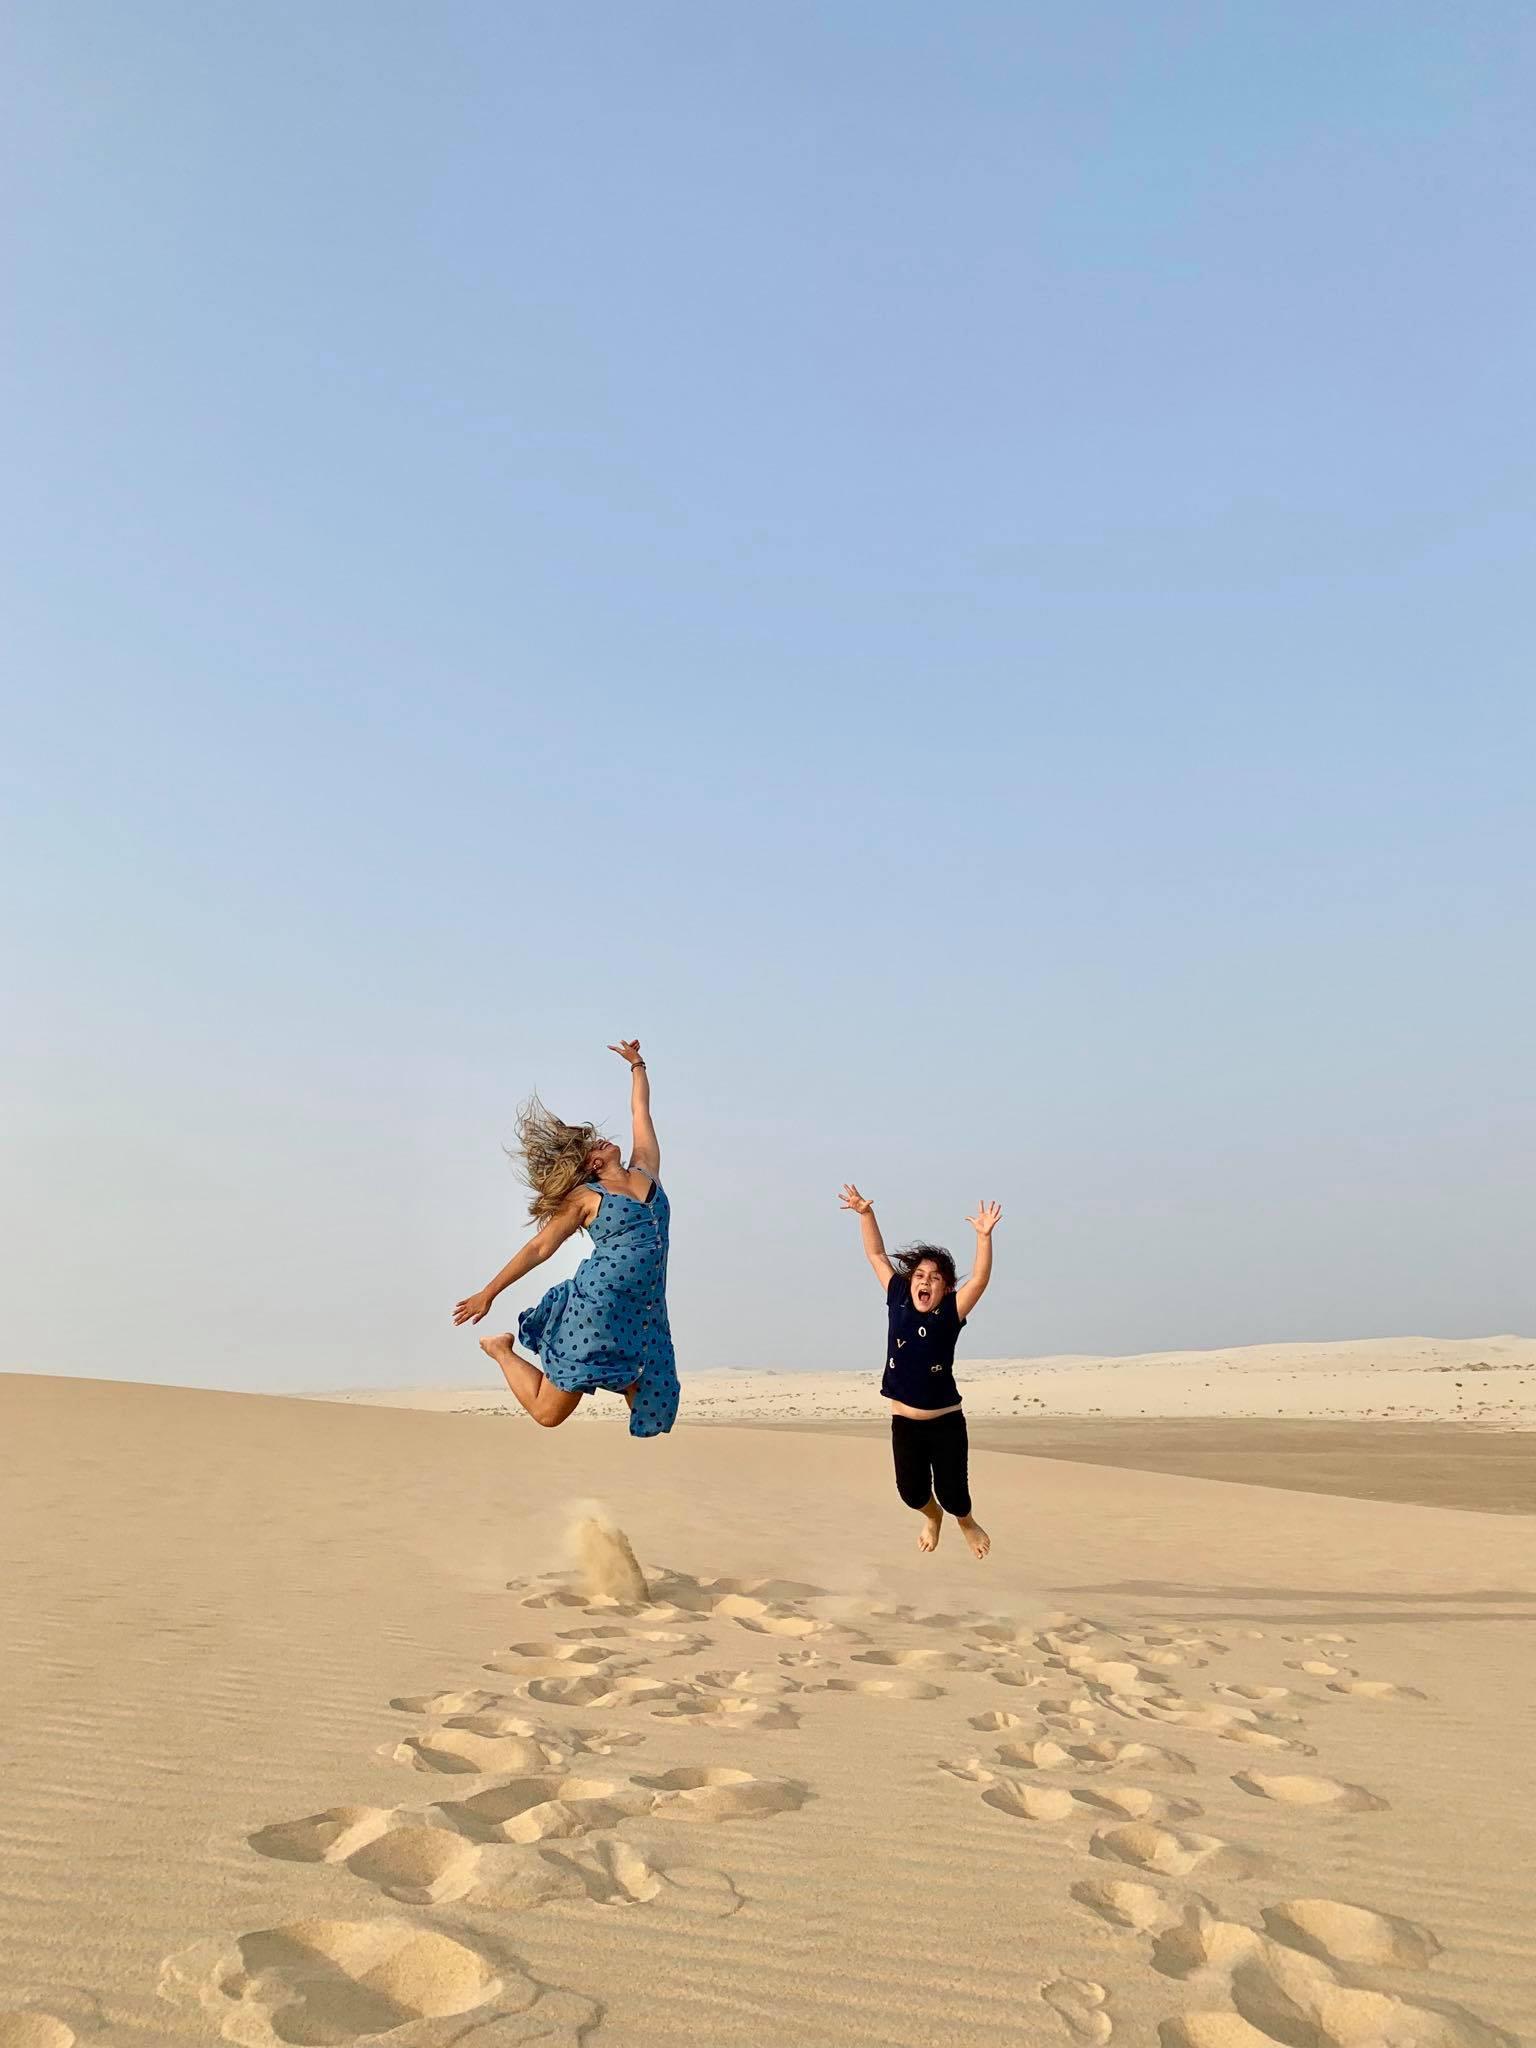 Kach Solo Travels in 2019 I did a 20-hour layover in Doha, QATAR.jpg